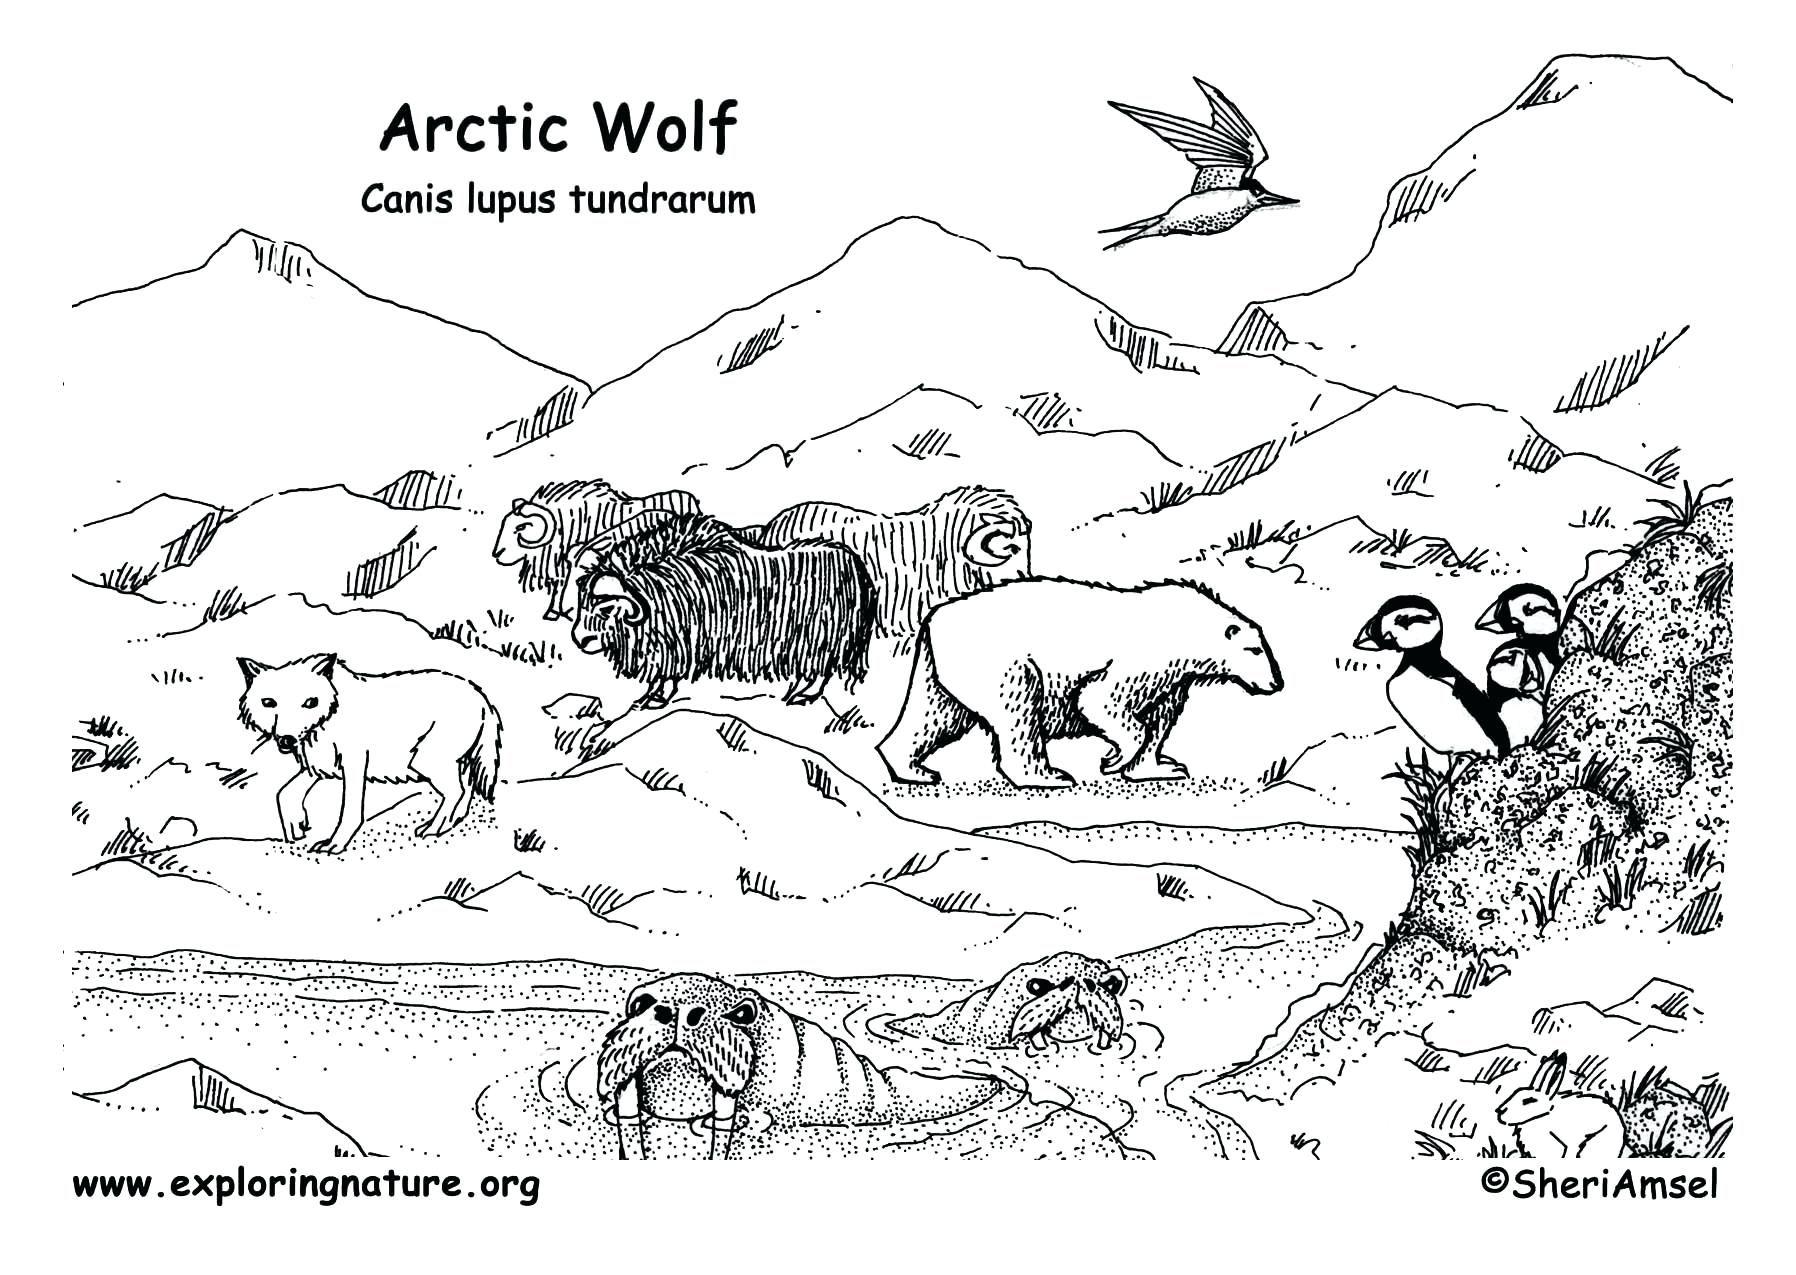 Arctic Habitat Coloring Pages Collection Arctic Habitat Polar Bear Color Art In The Park